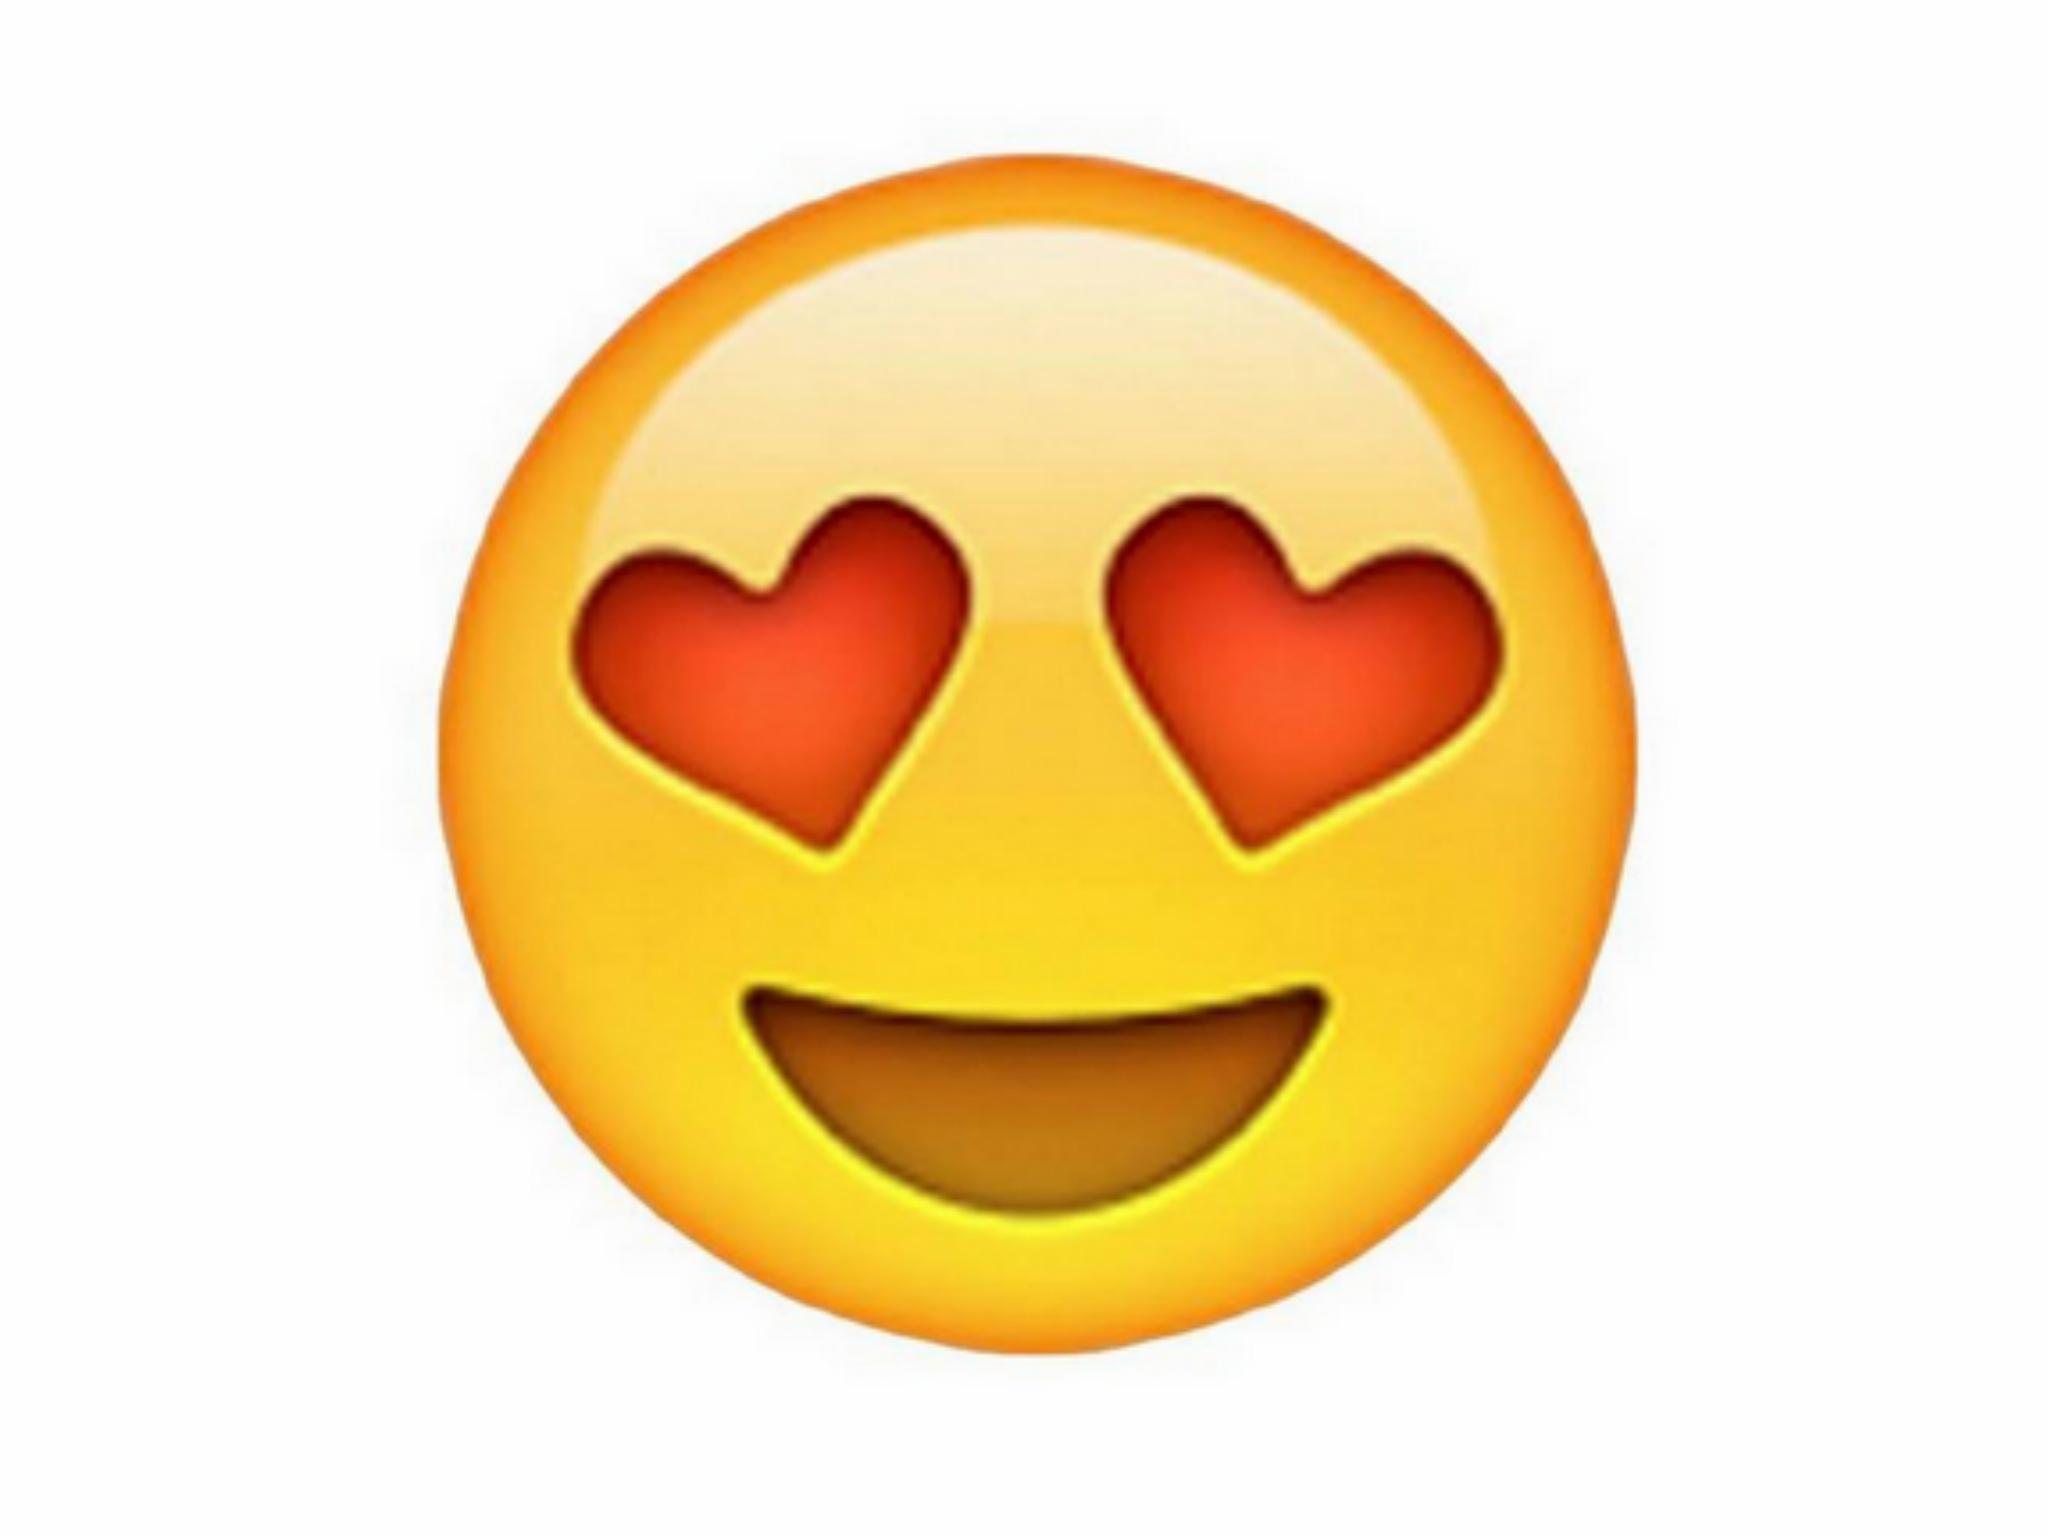 50+] Emoji Wallpapers Maker Online on WallpaperSafari